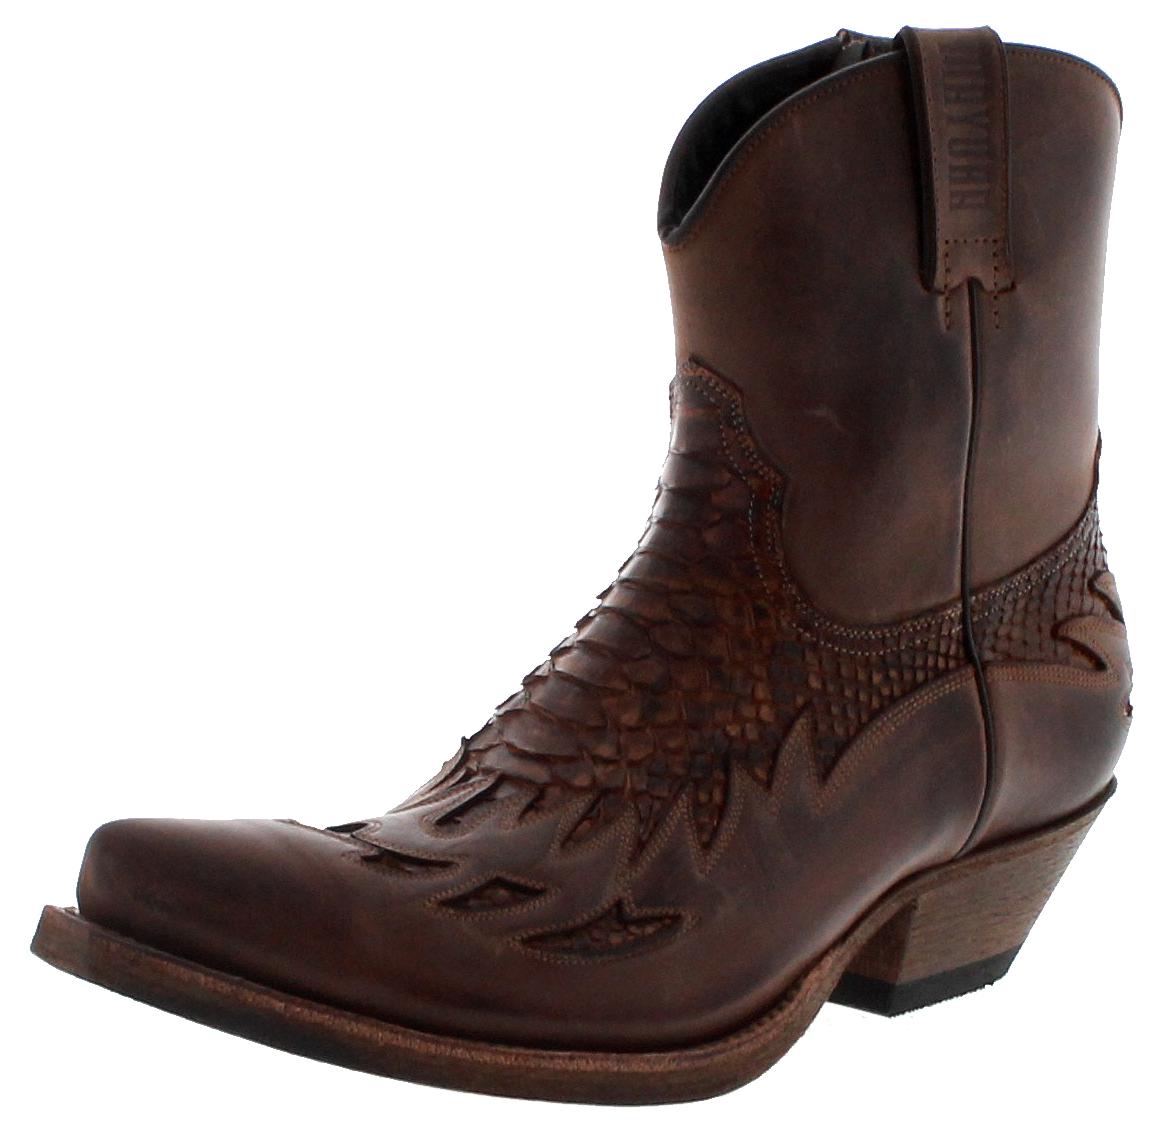 Mayura Boots MB012 Castana Mens Western Bootee - brown